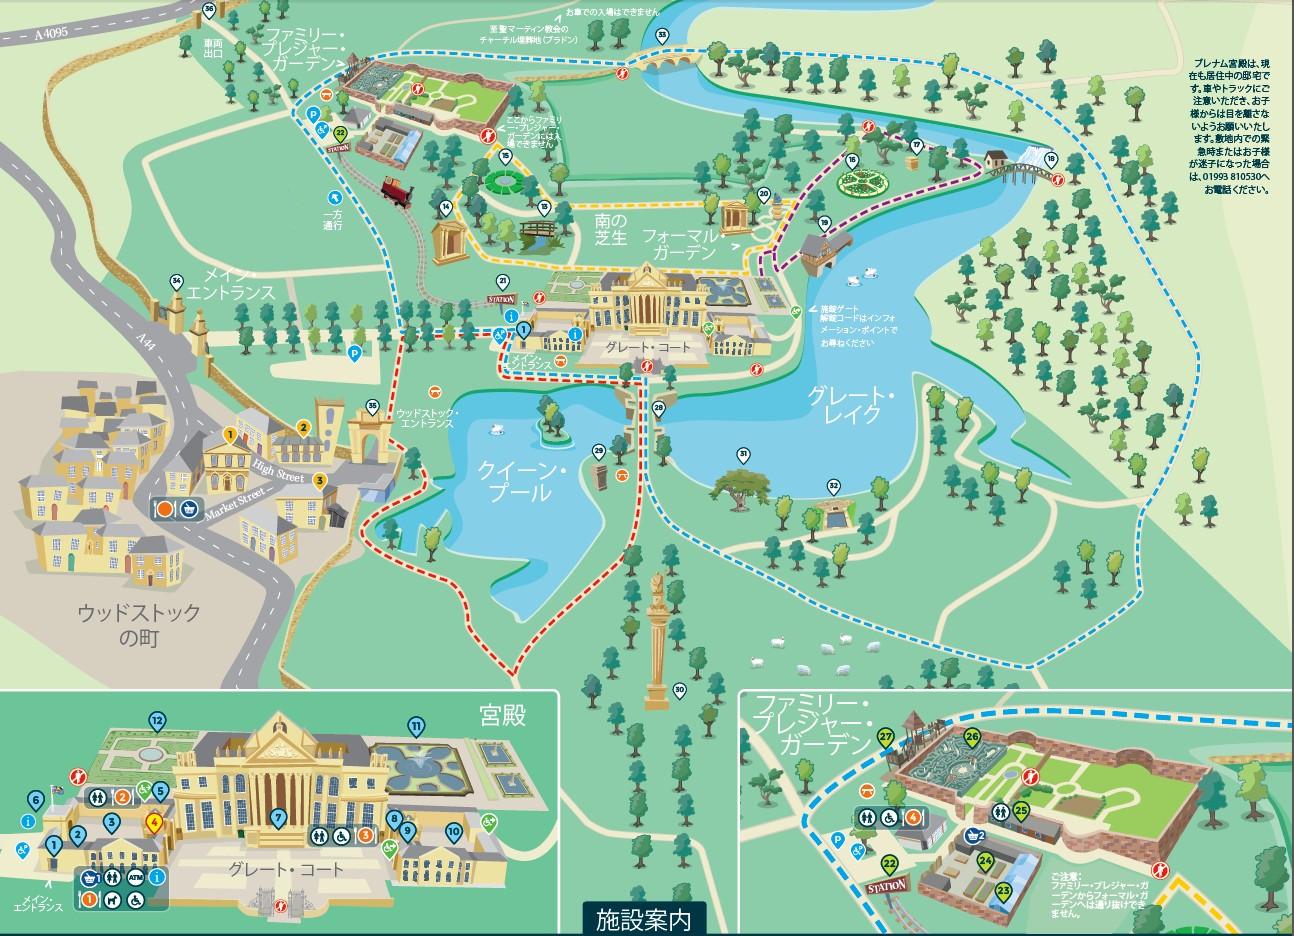 1905-04-Blenheim-Blenheim map 日本語